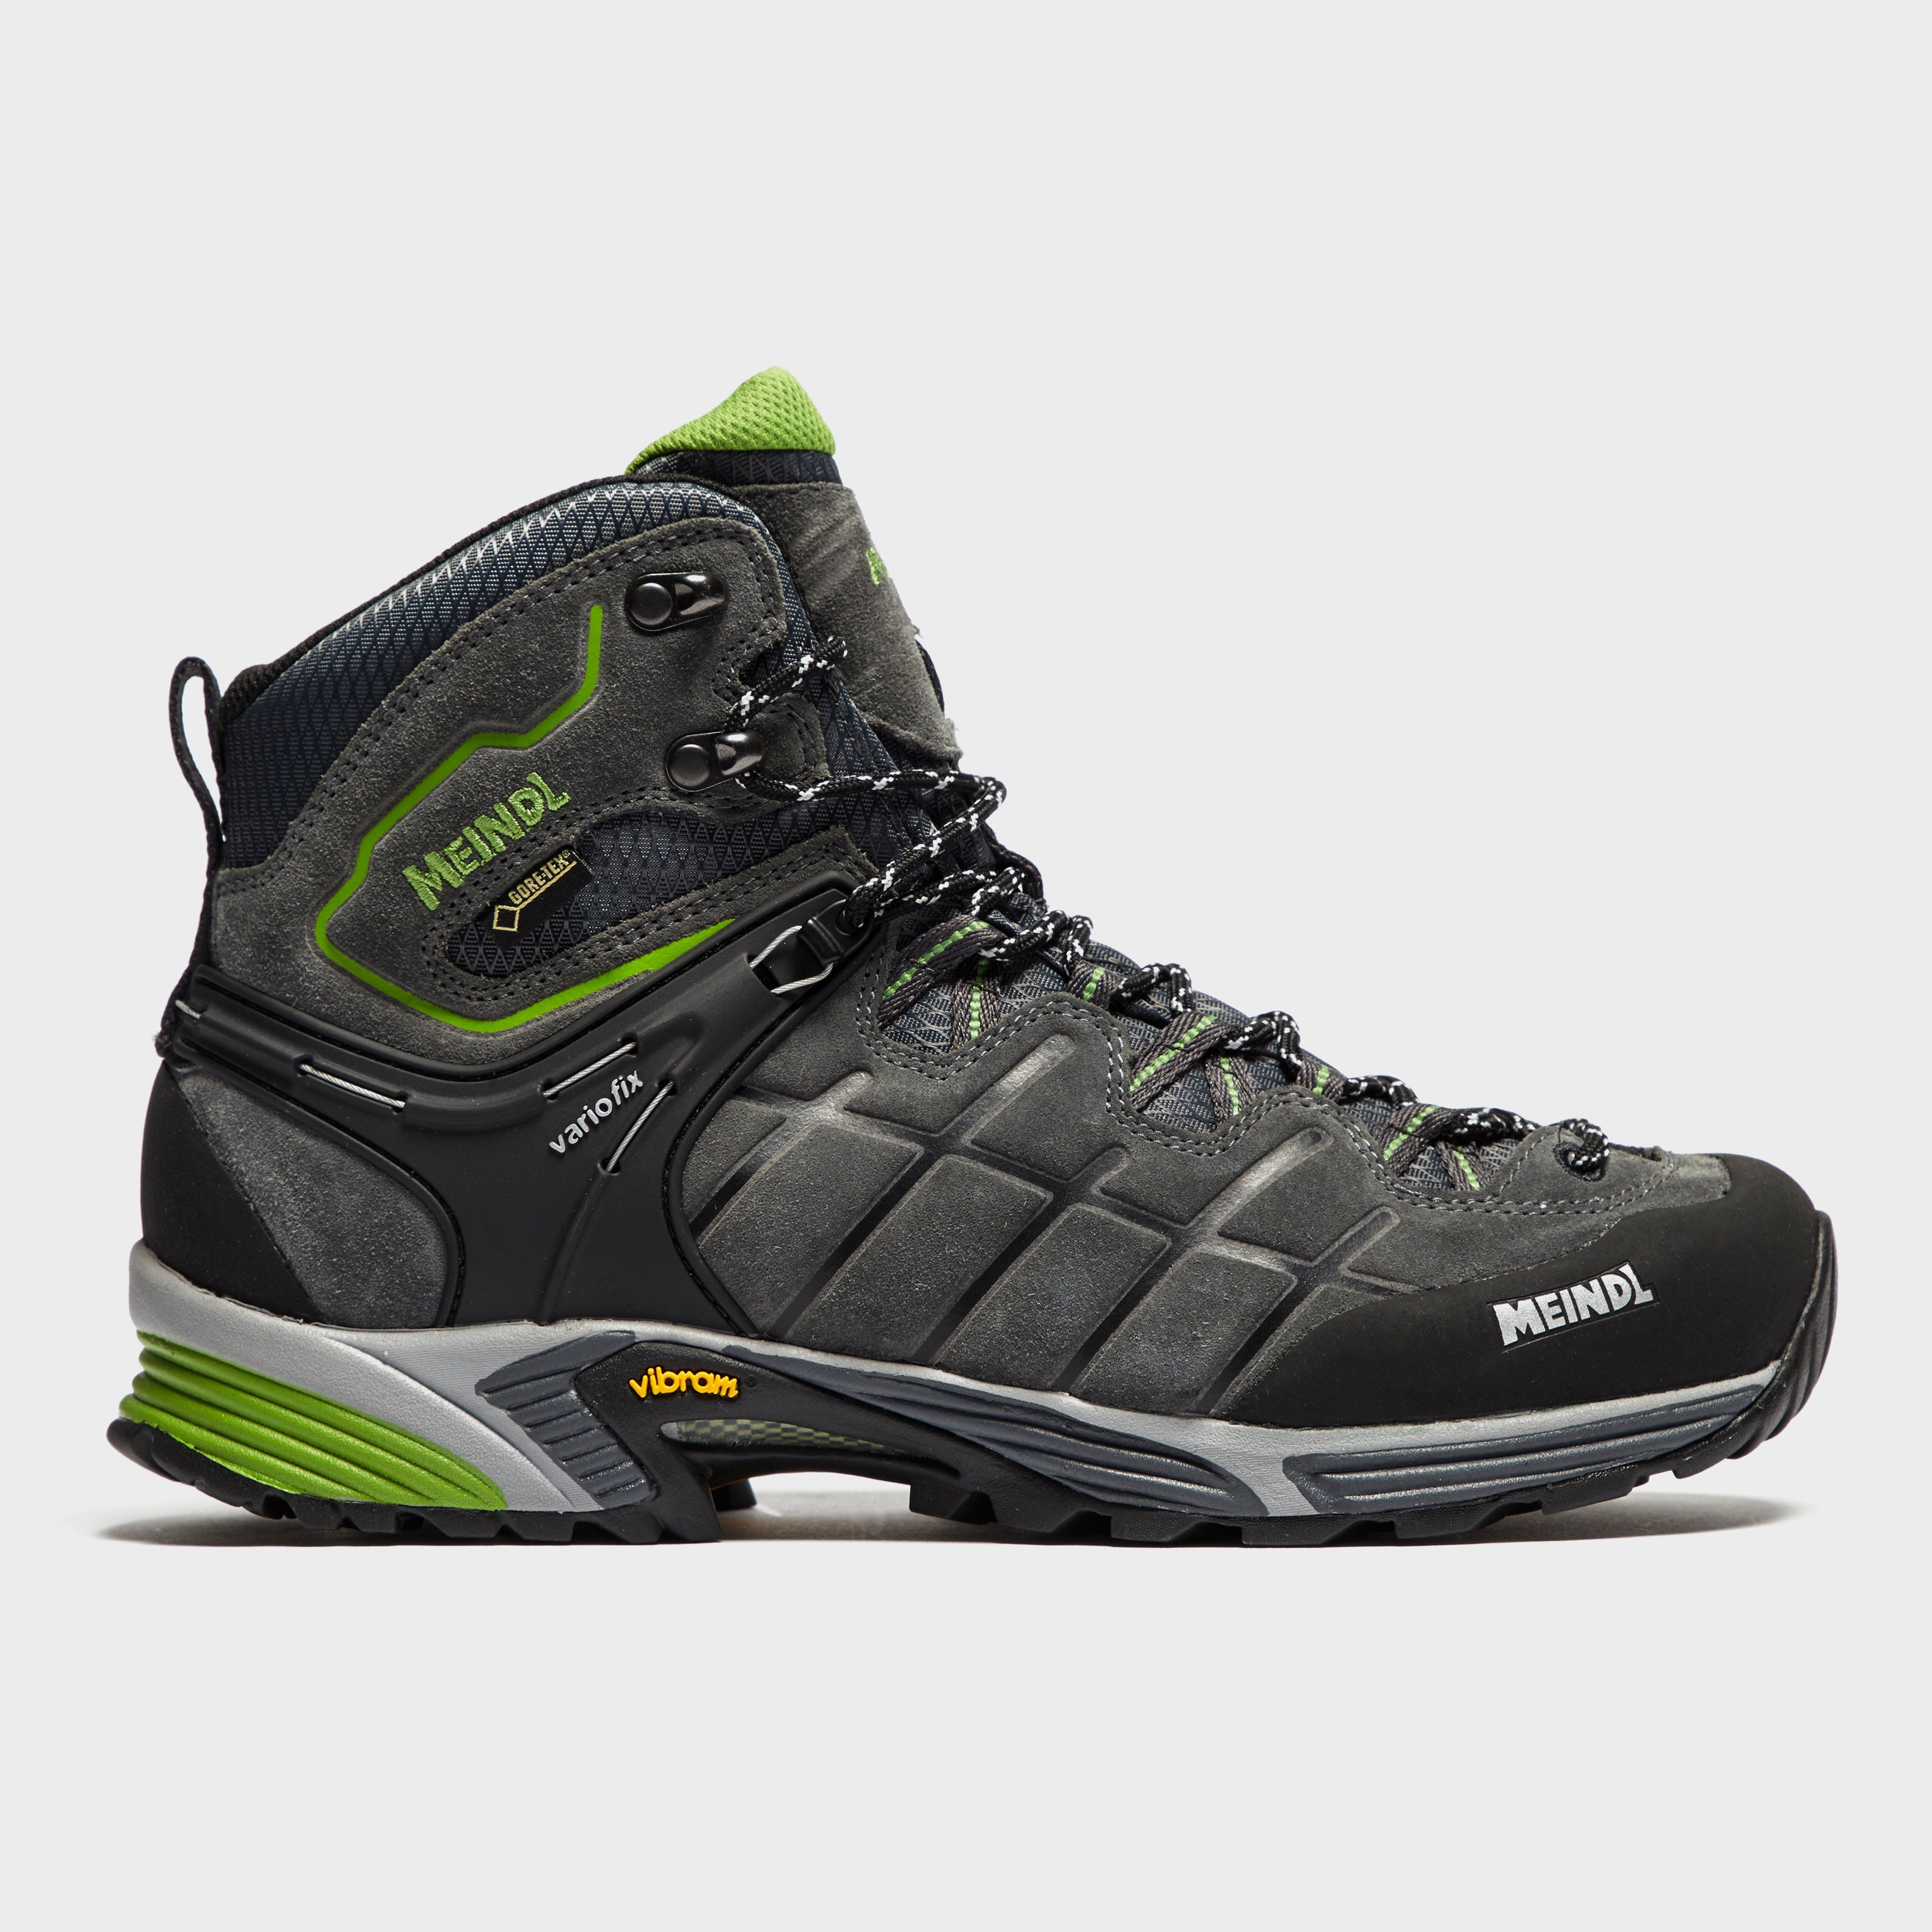 MEINDL Men's Kapstadt GORE-TEX® Hiking Boots